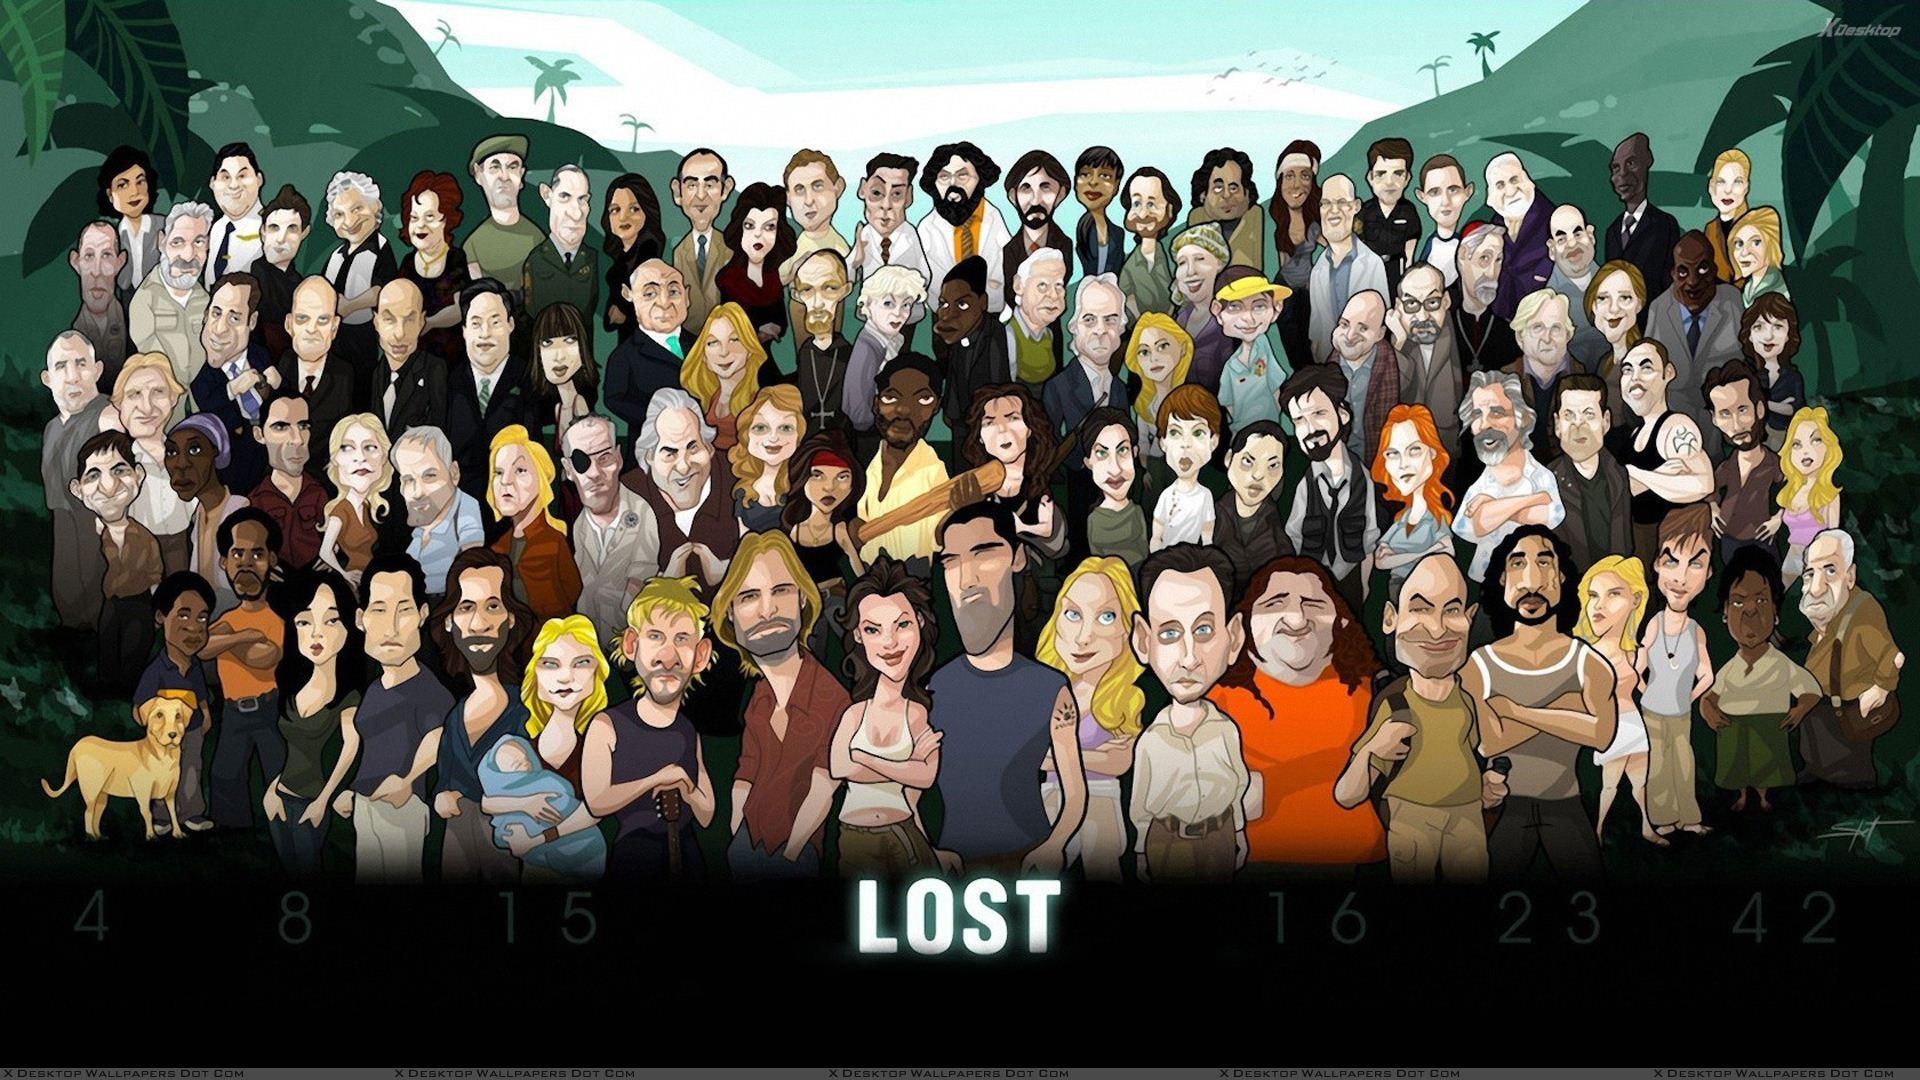 Lost (season 6)